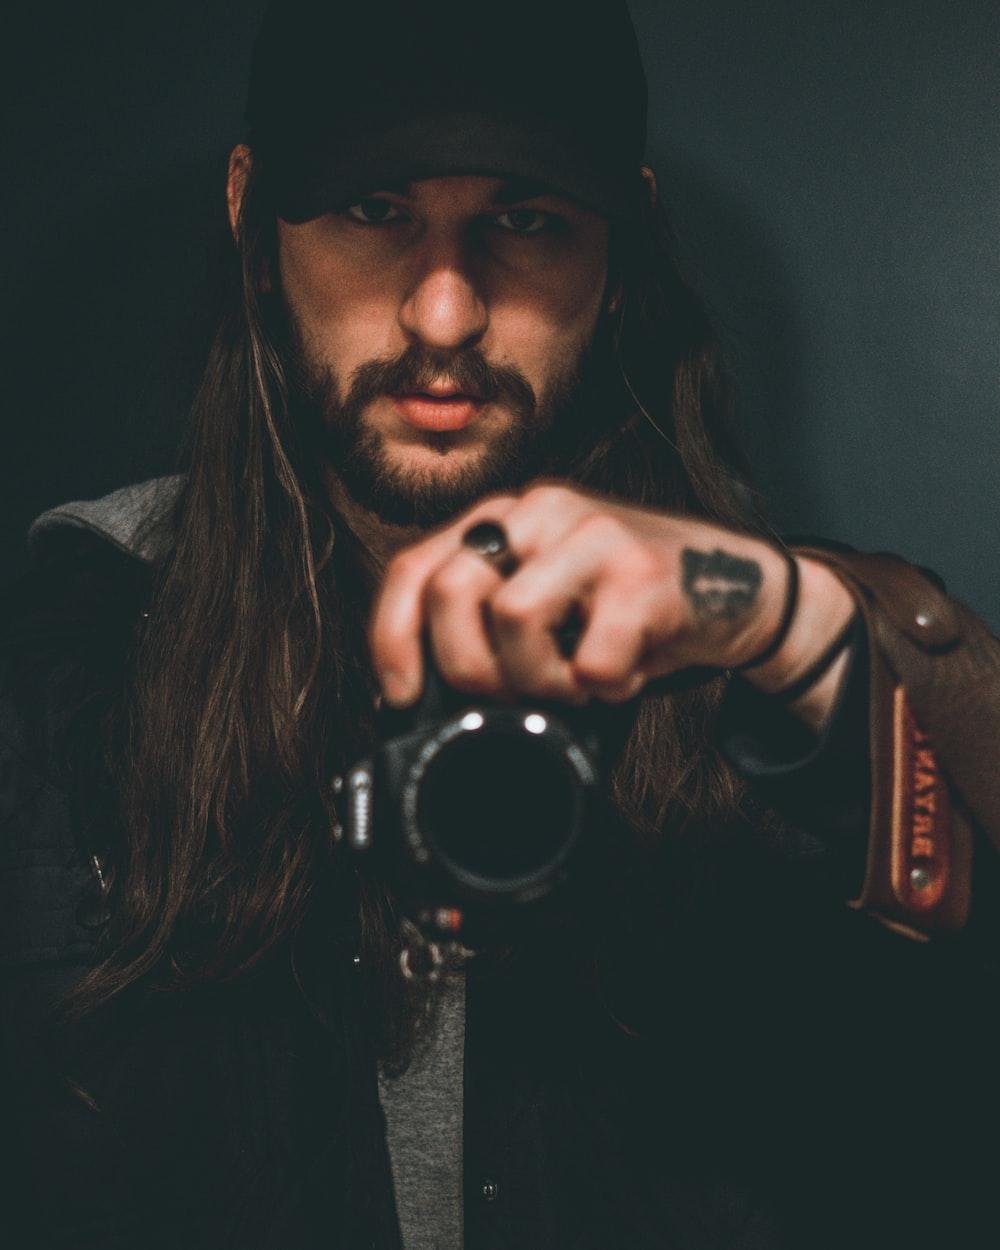 man holding DSLR camera